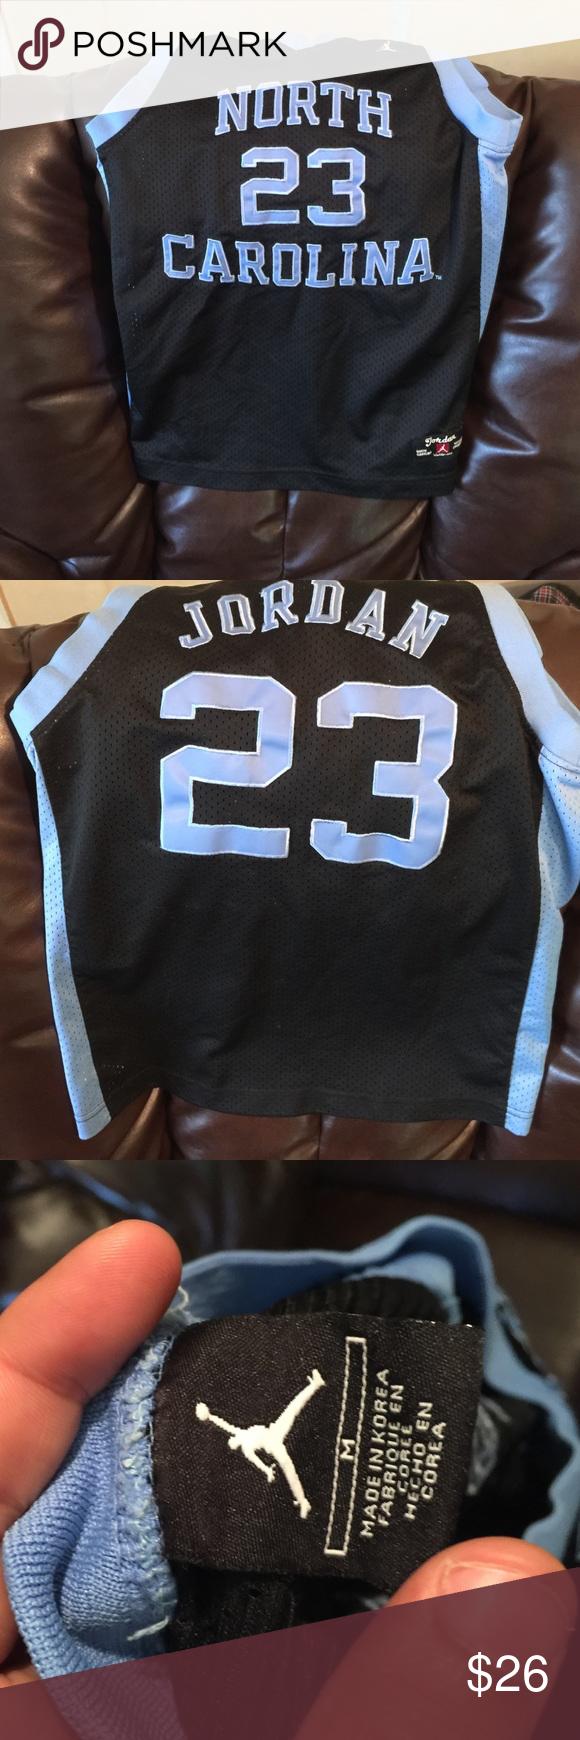 gnvlvc Michael Jordan\'s North Carolina kids jersey | D, Tops and Jordans